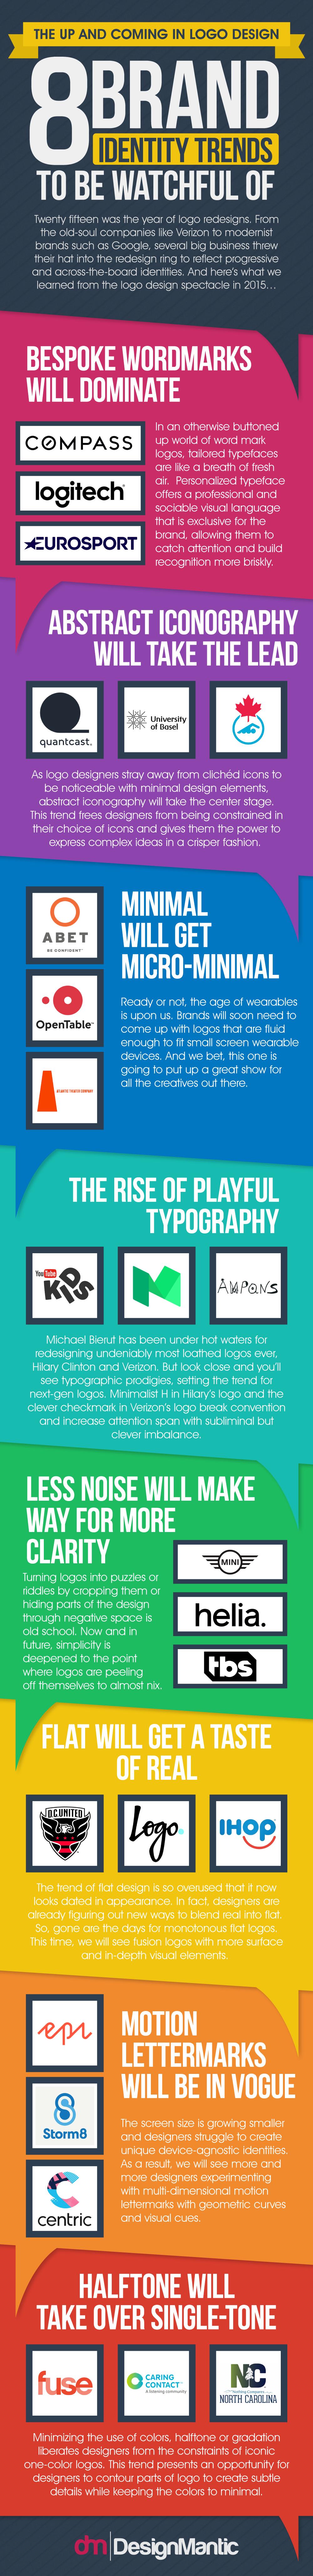 8 Brand Identity Trends 2016